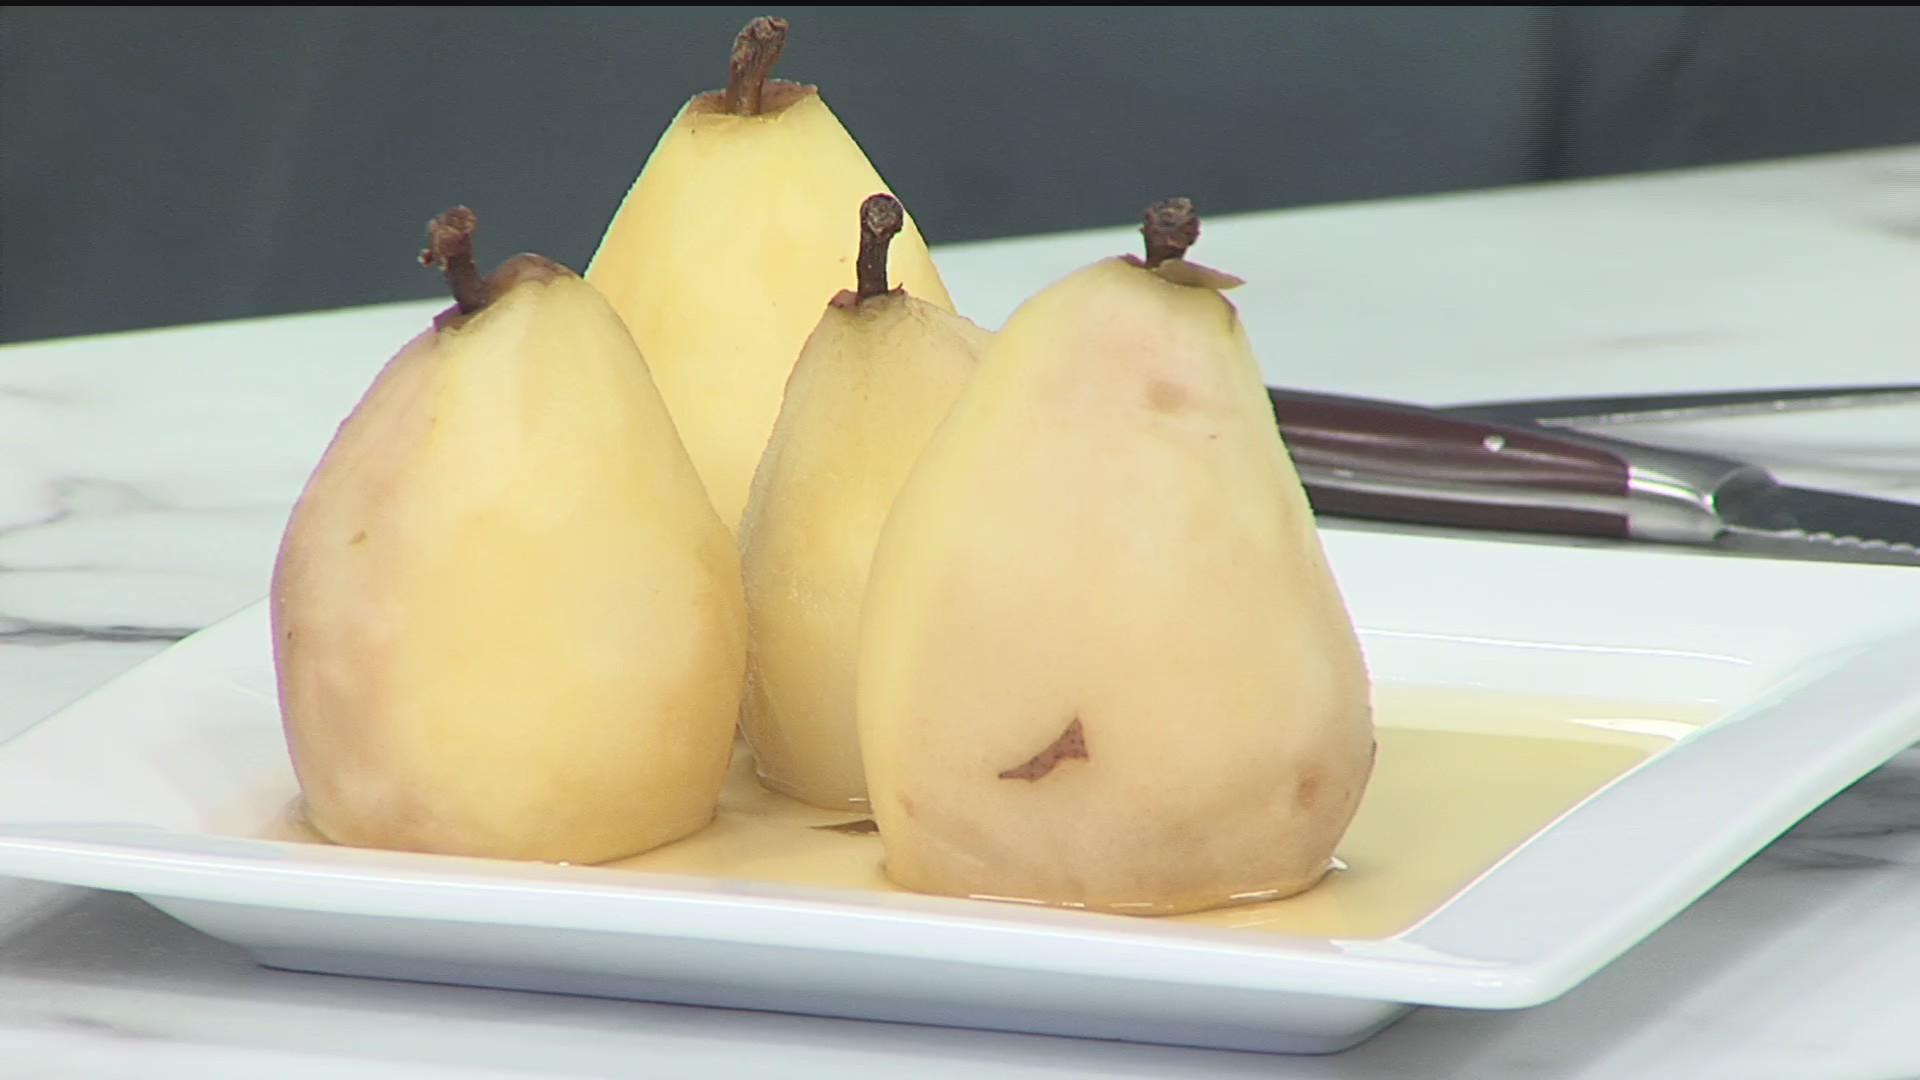 Poached Pears - Crock-Pot Craze - 5/9/19